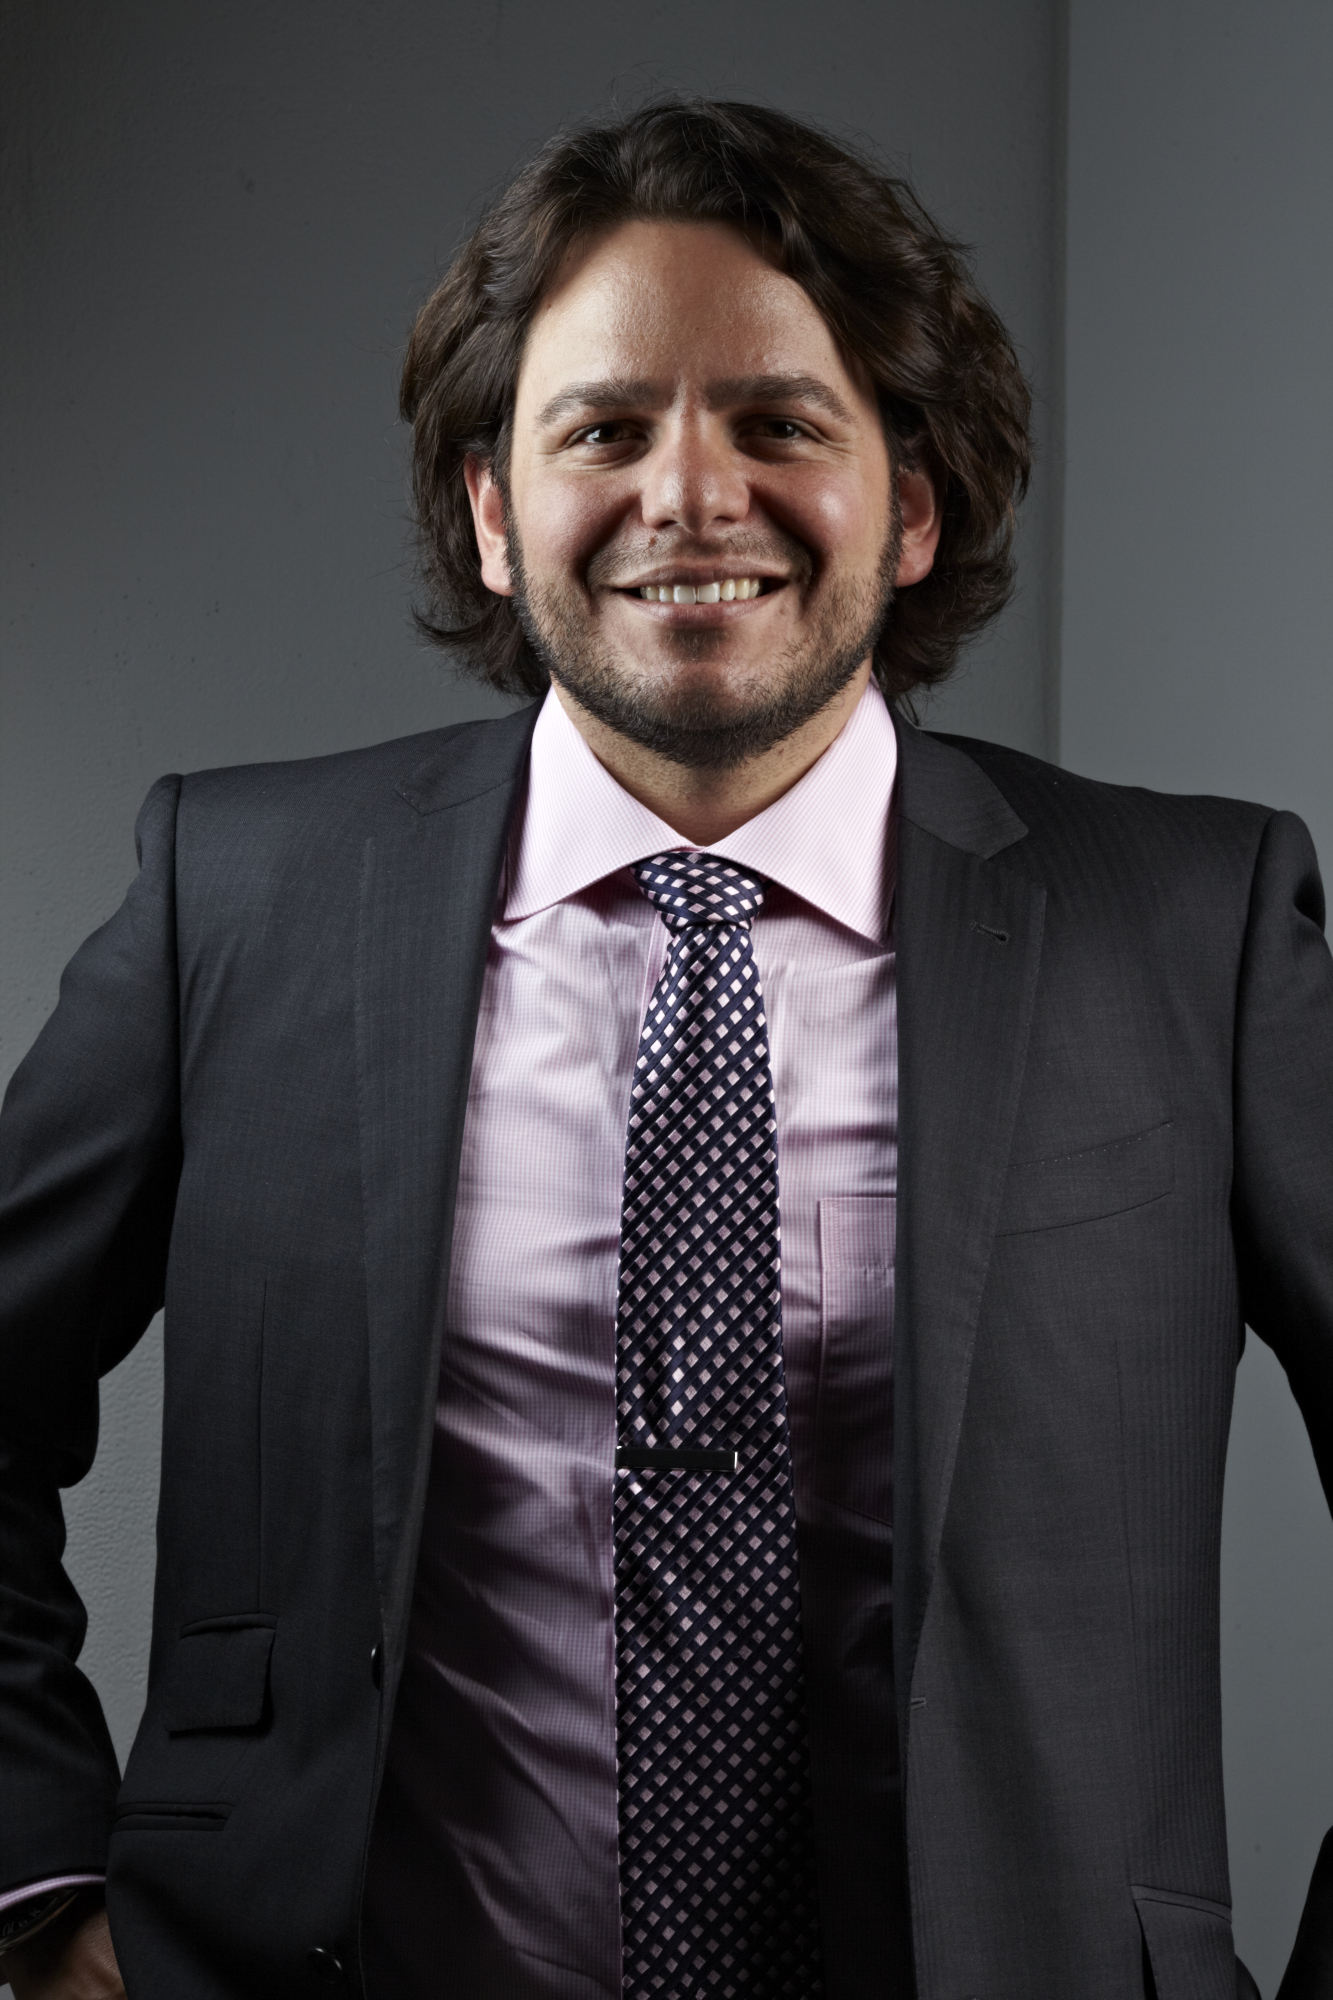 Ignacio Oreamuno, Executive Director of the Art Directors Club in New York. Photo by Monte Isom